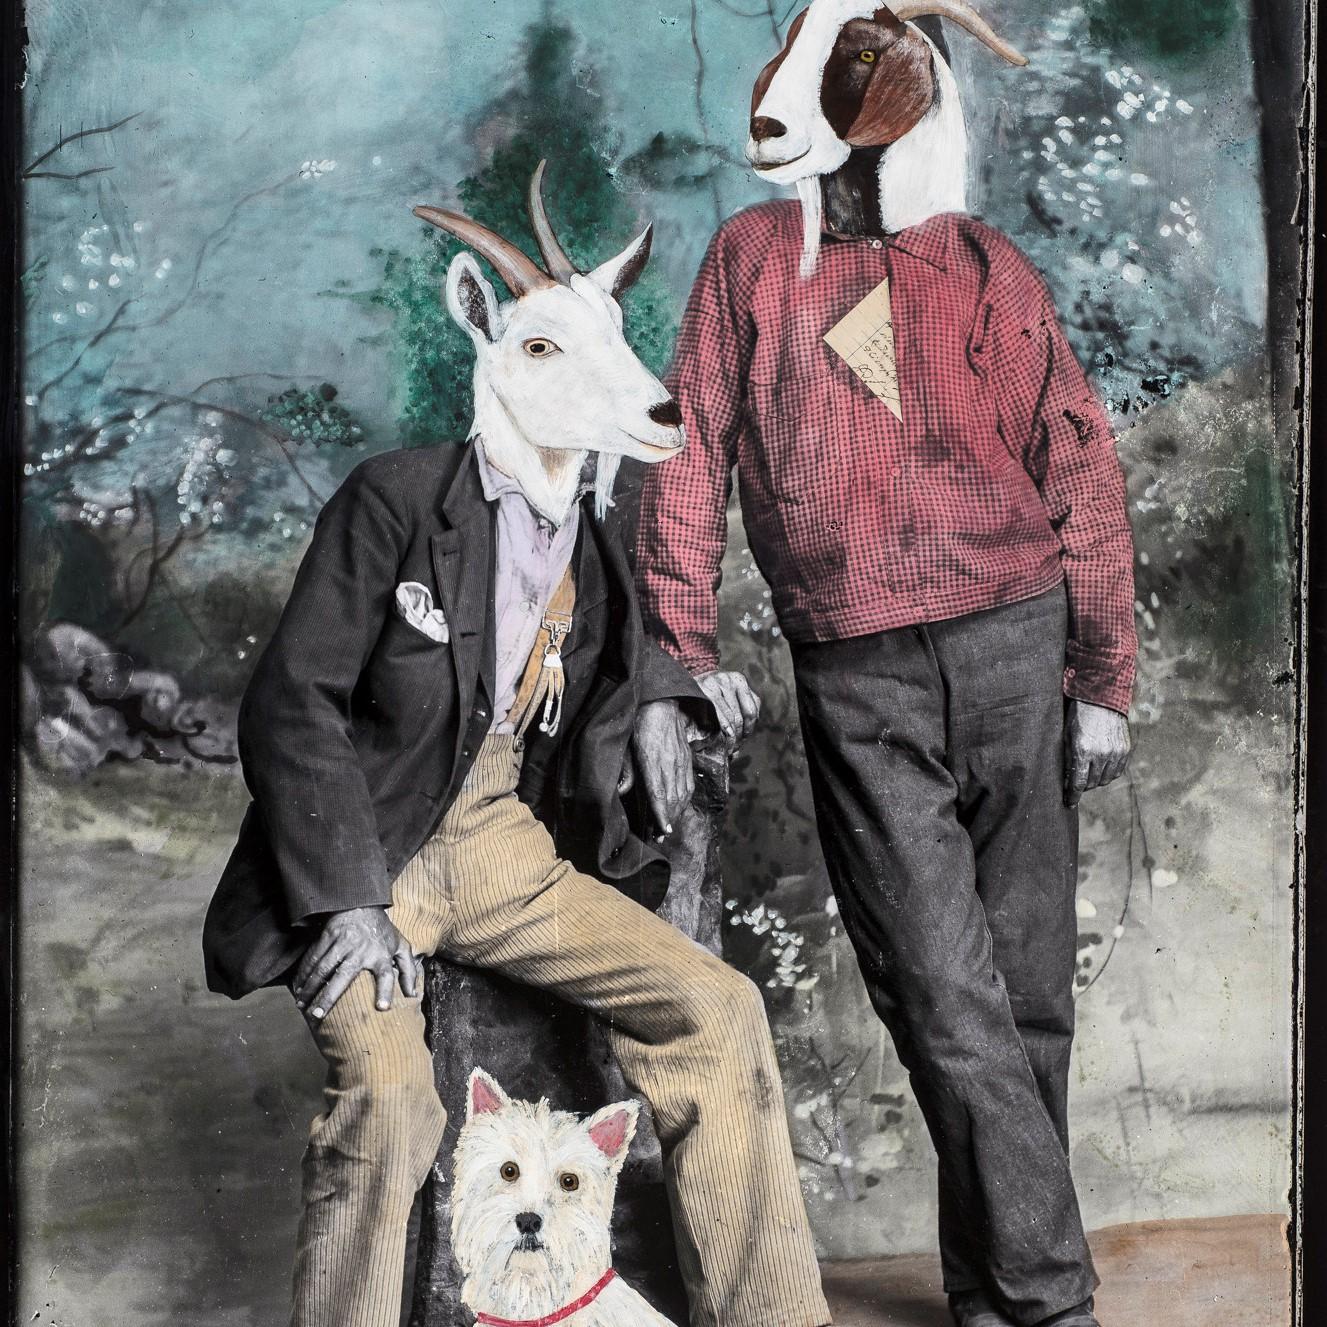 aeThe-Lust-of-the-Goat-is-the-Bounty-of-God (2).jpg